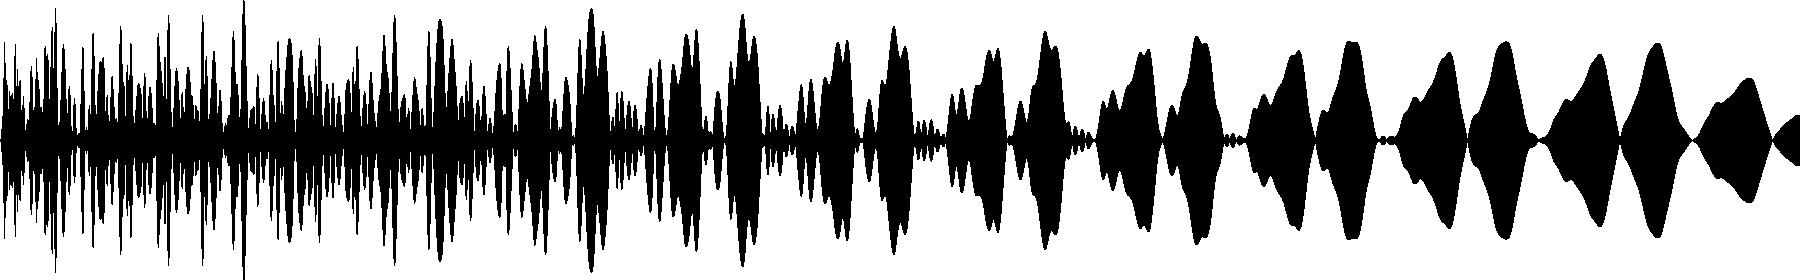 vedh bass cut 002 g